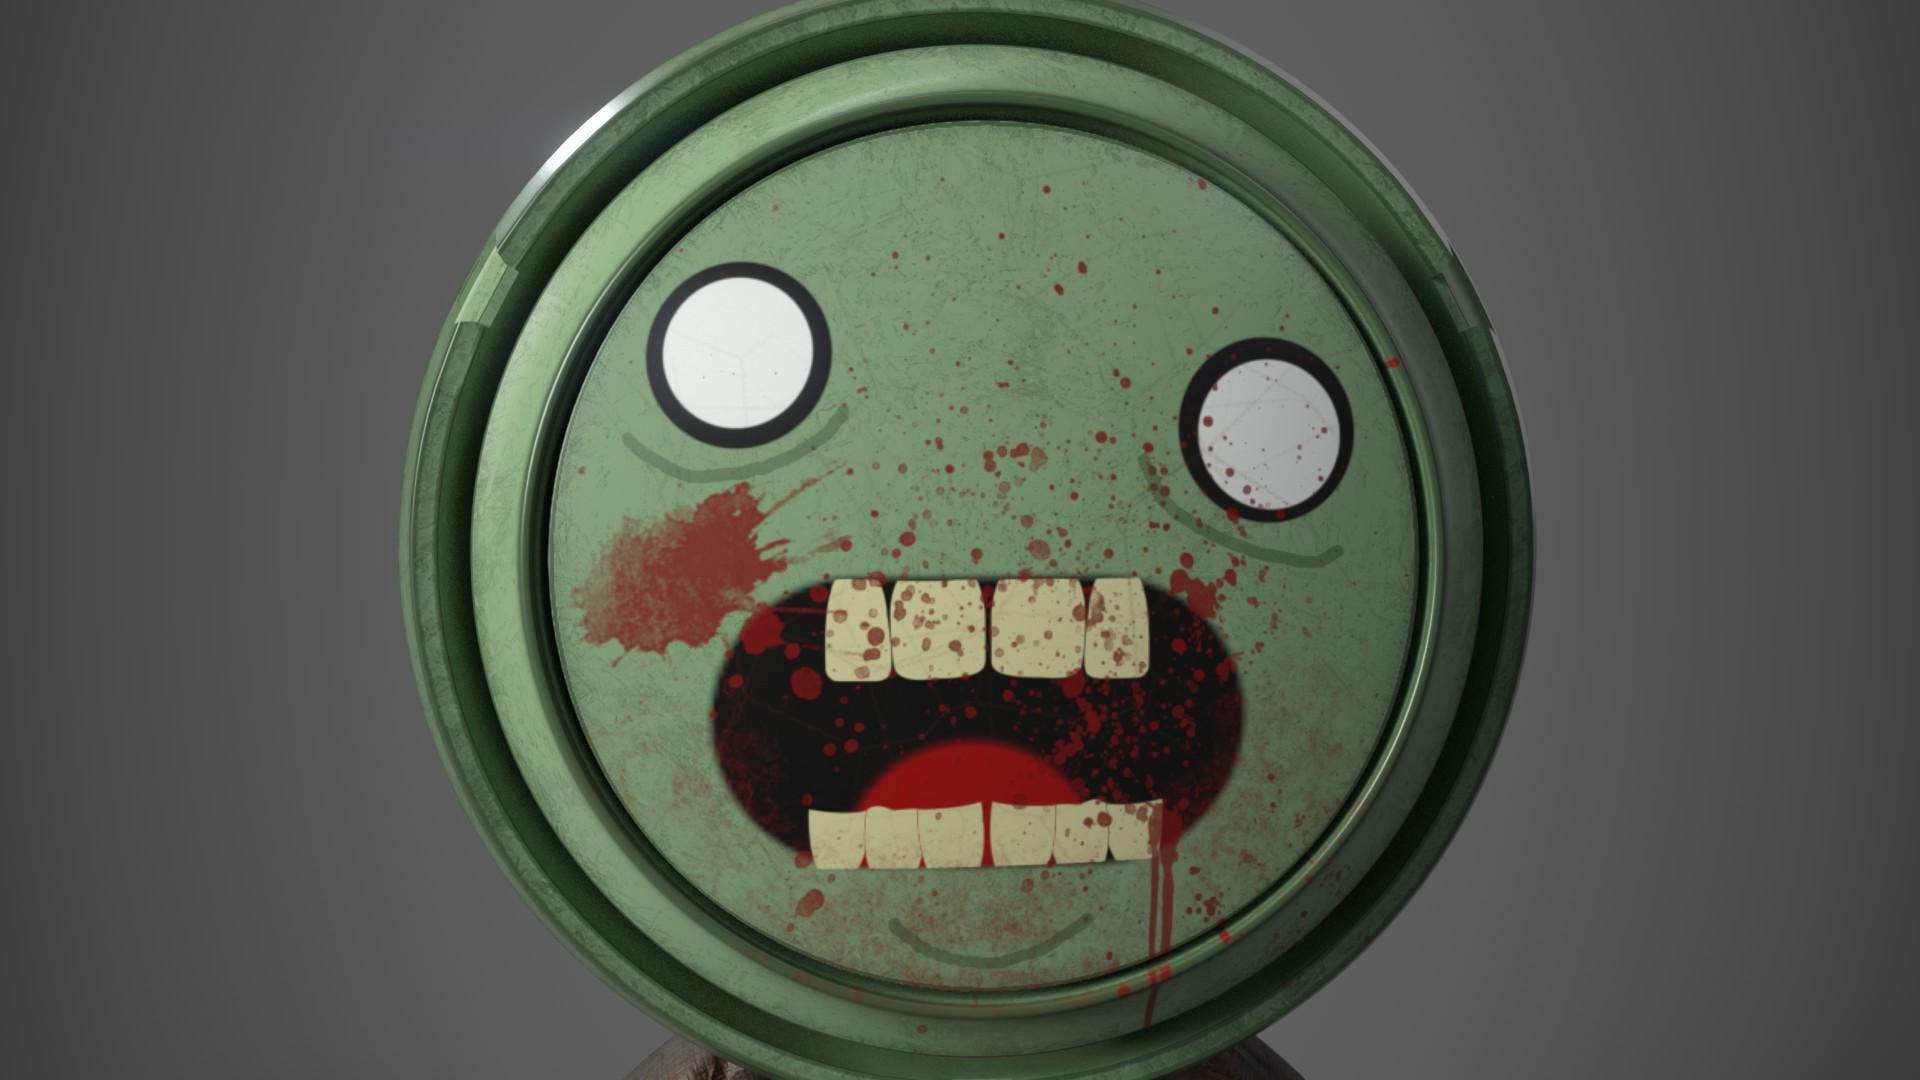 Conor scott zombmat7